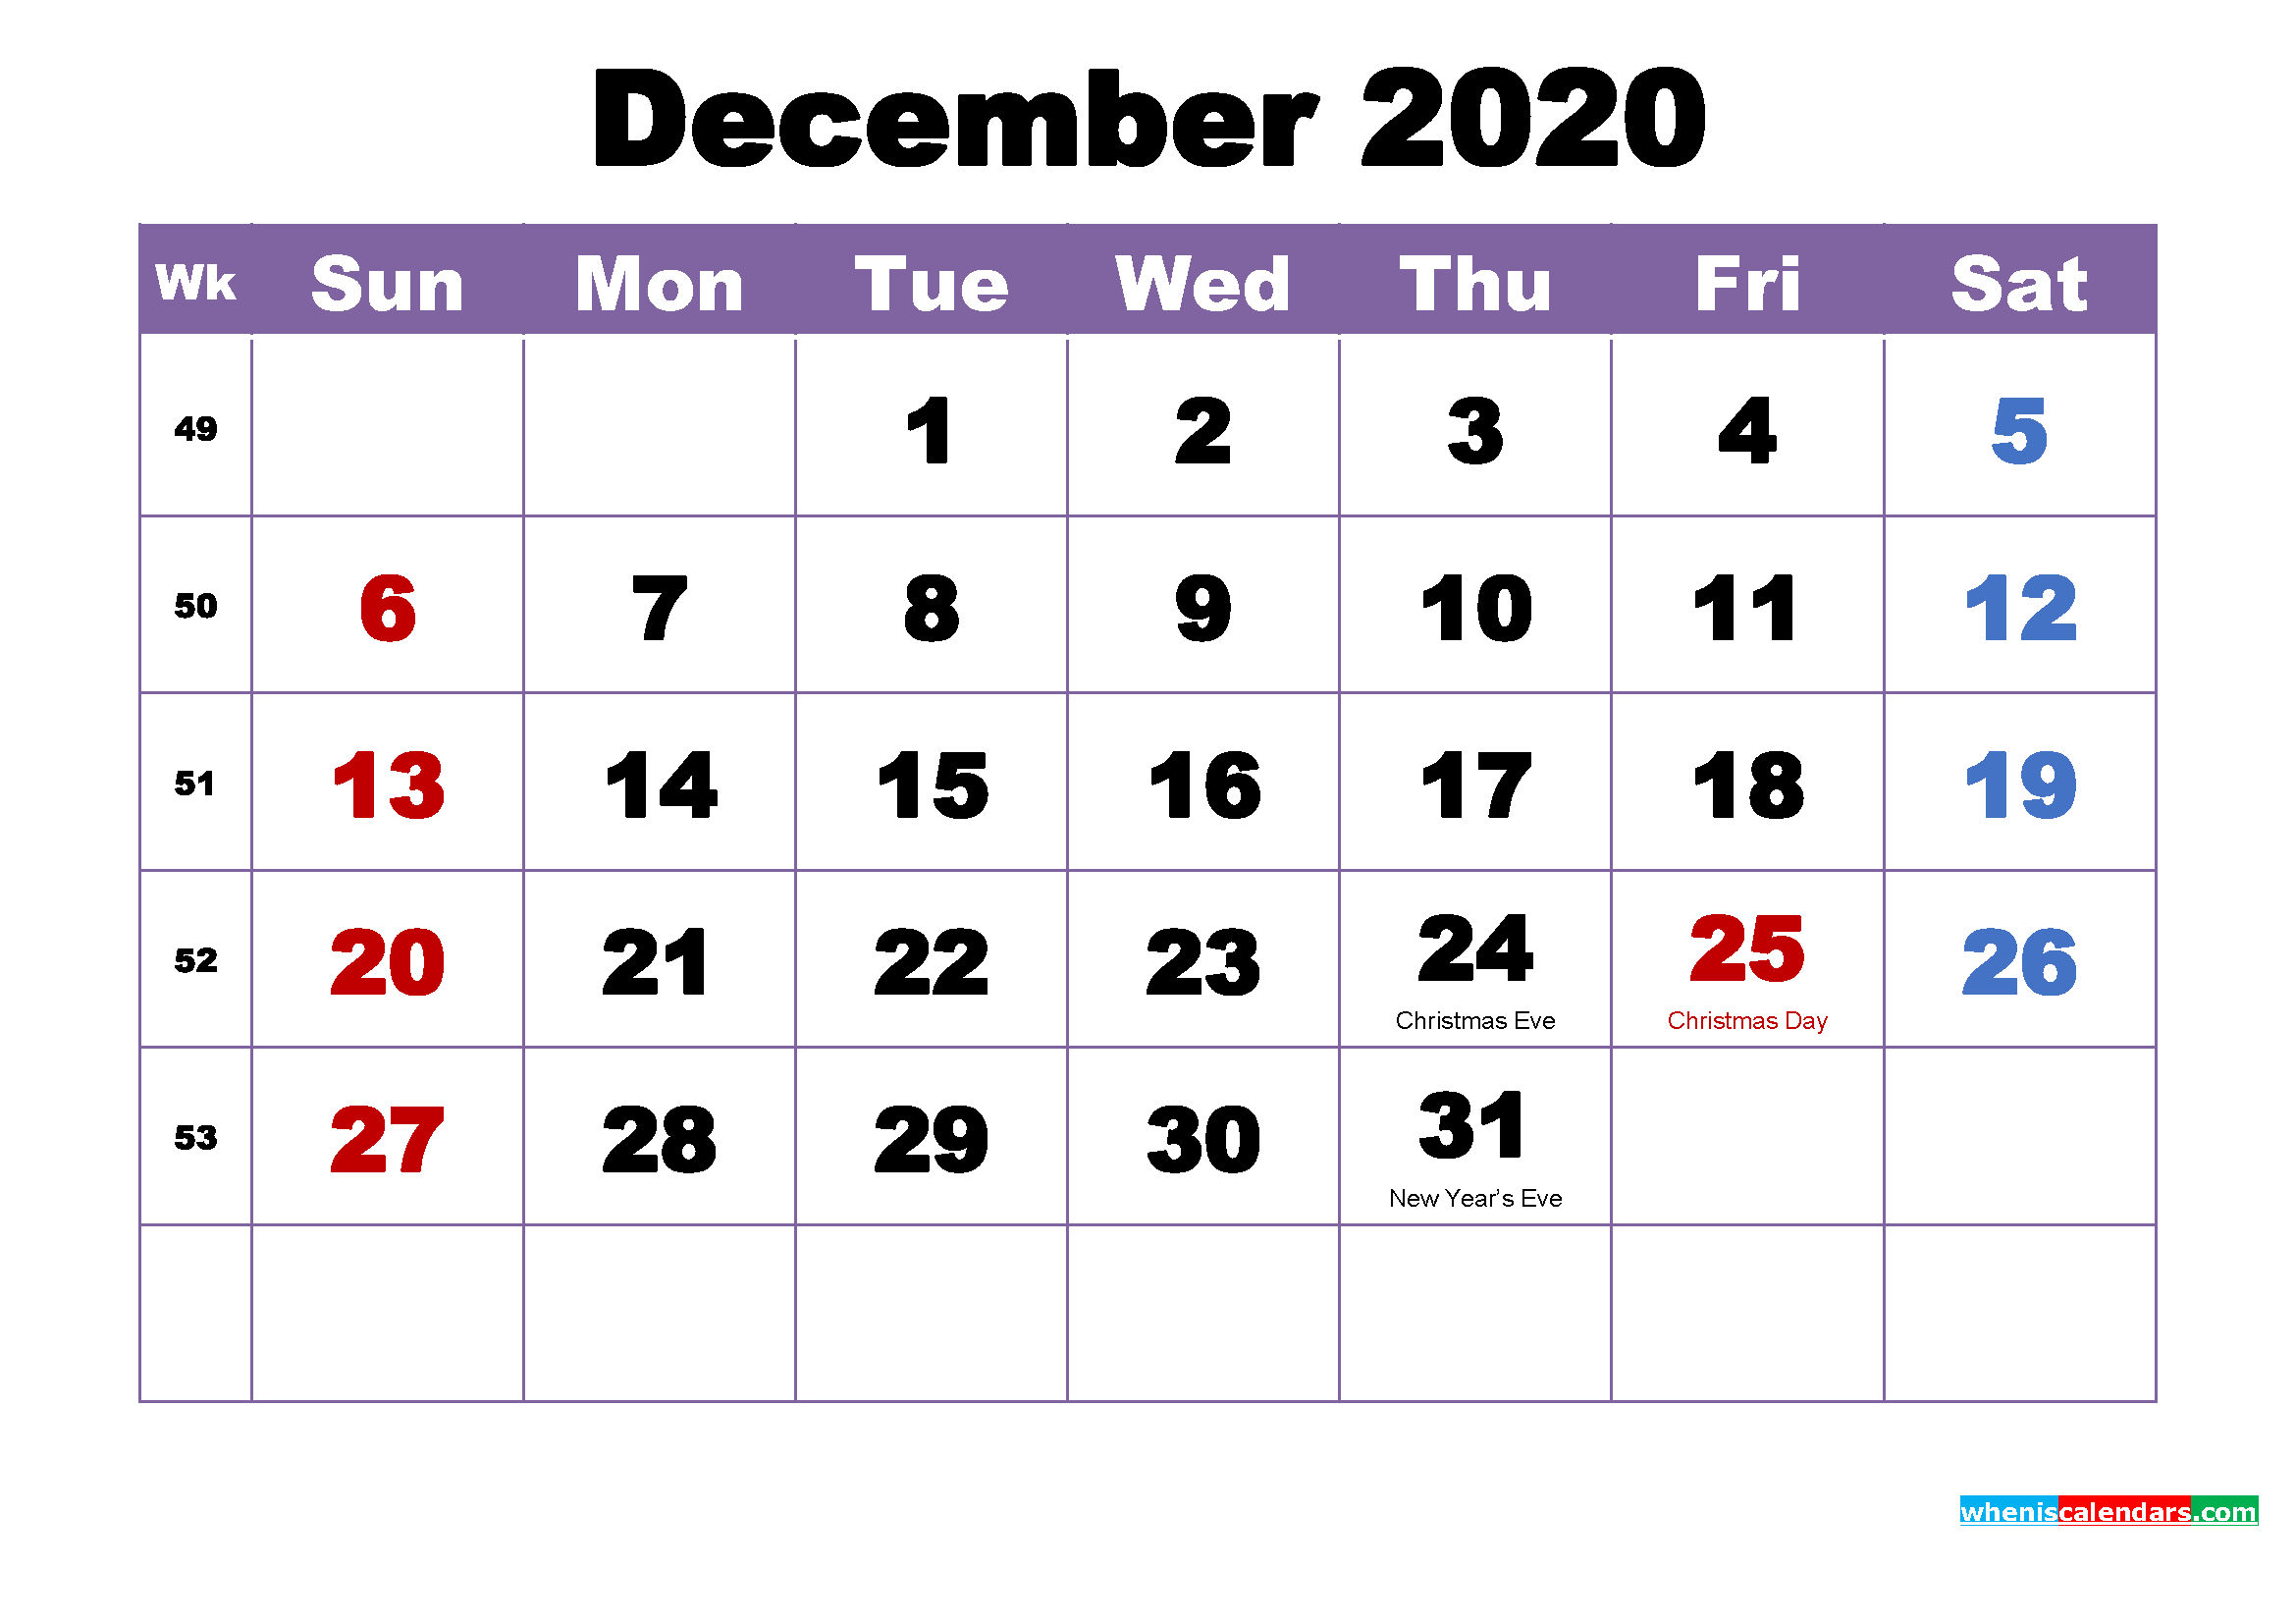 December 2020 Desktop Calendar Monthly